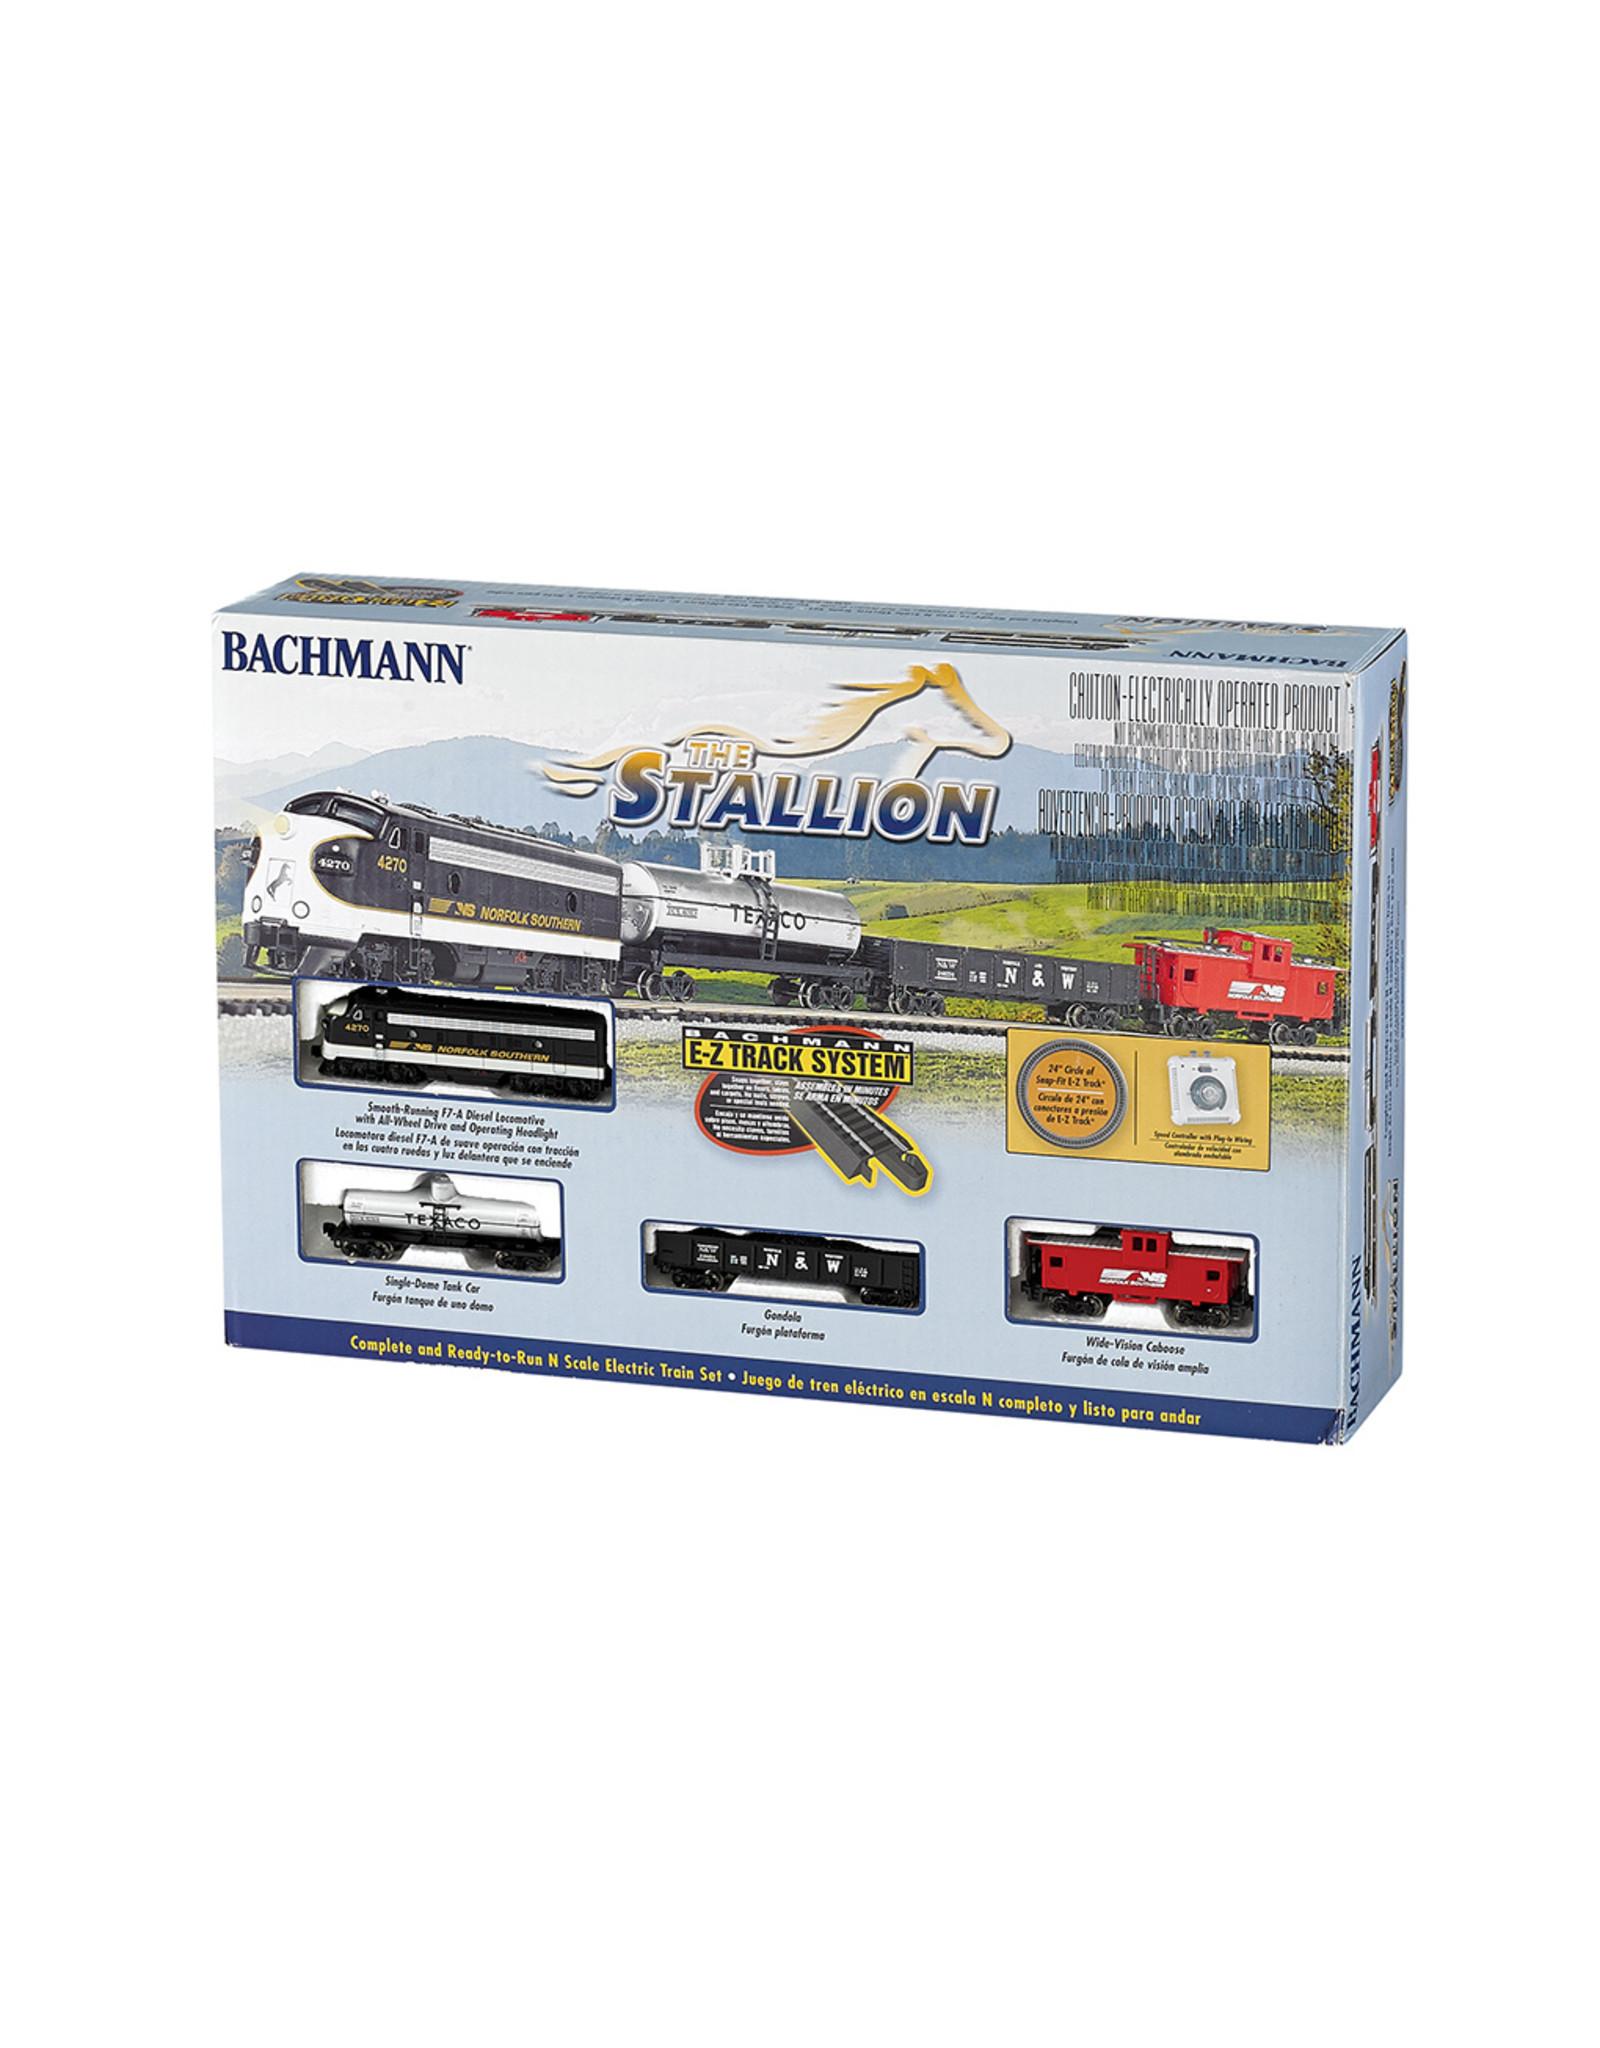 Bachmann The Stallion RTR N Scale Train Set